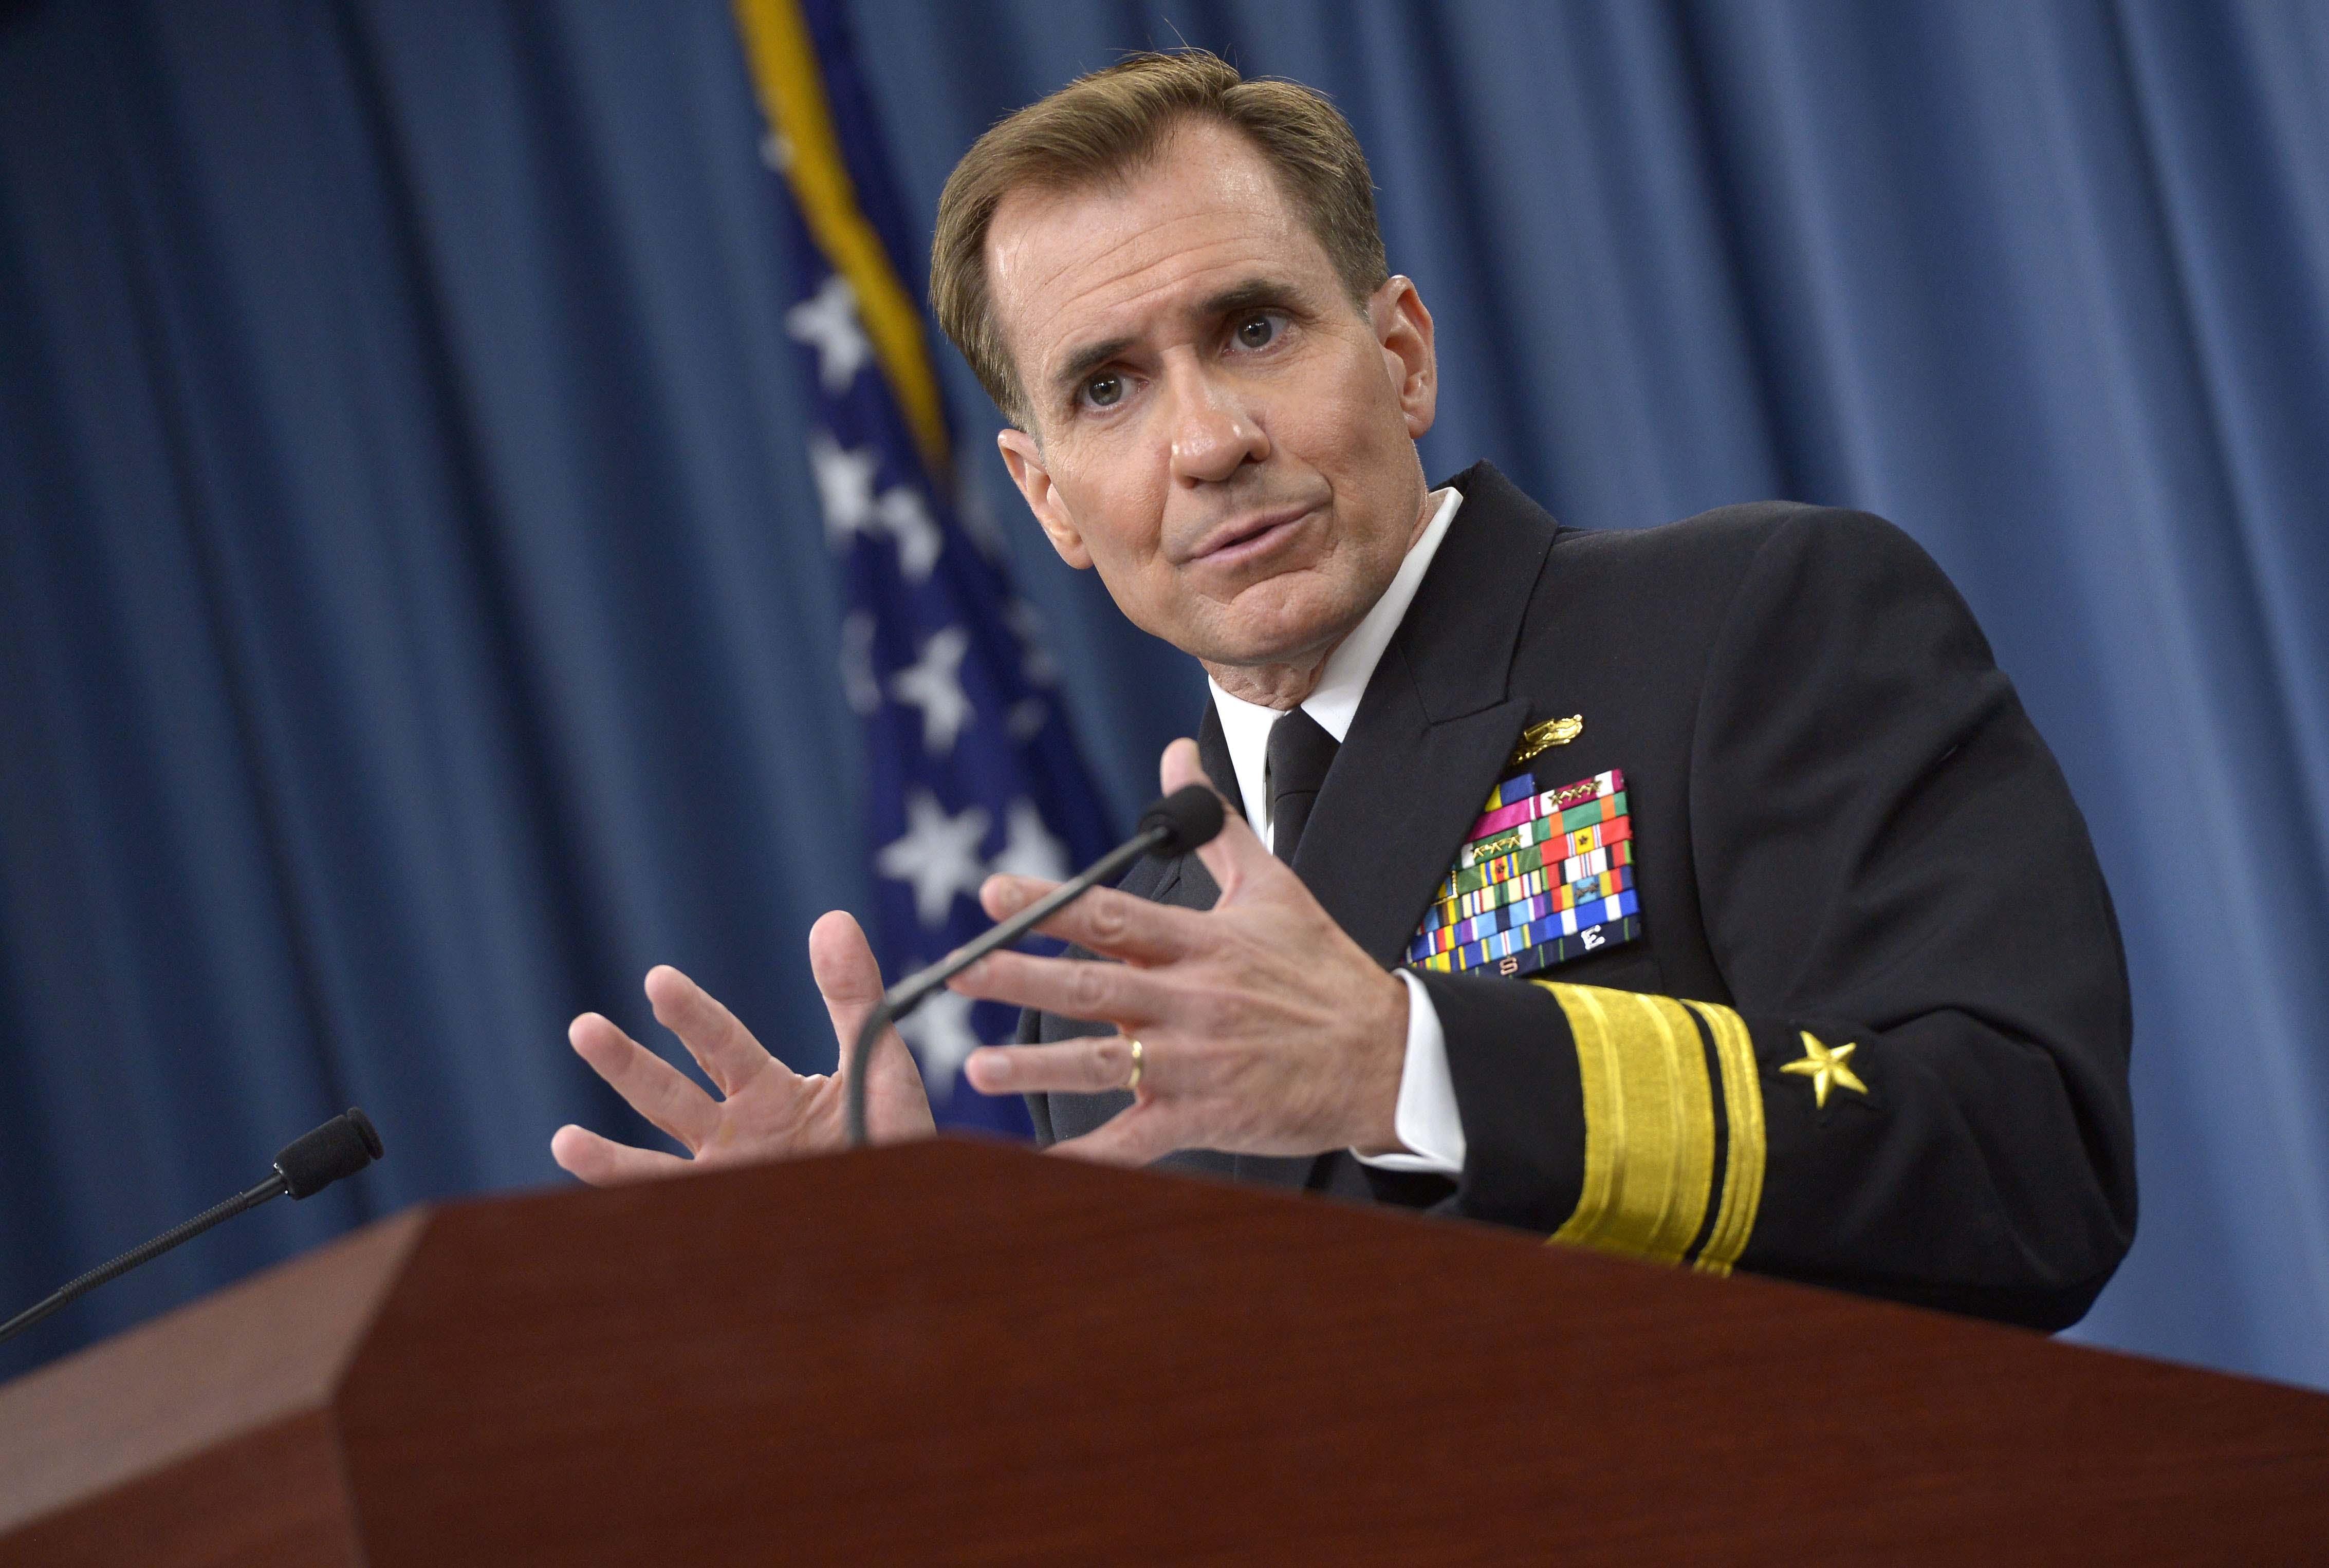 Pentagon Spokesman Rear Adm. John Kirby briefs the media on efforts to defeat ISIL September 2014 (DoD/ Glenn Fawcett)